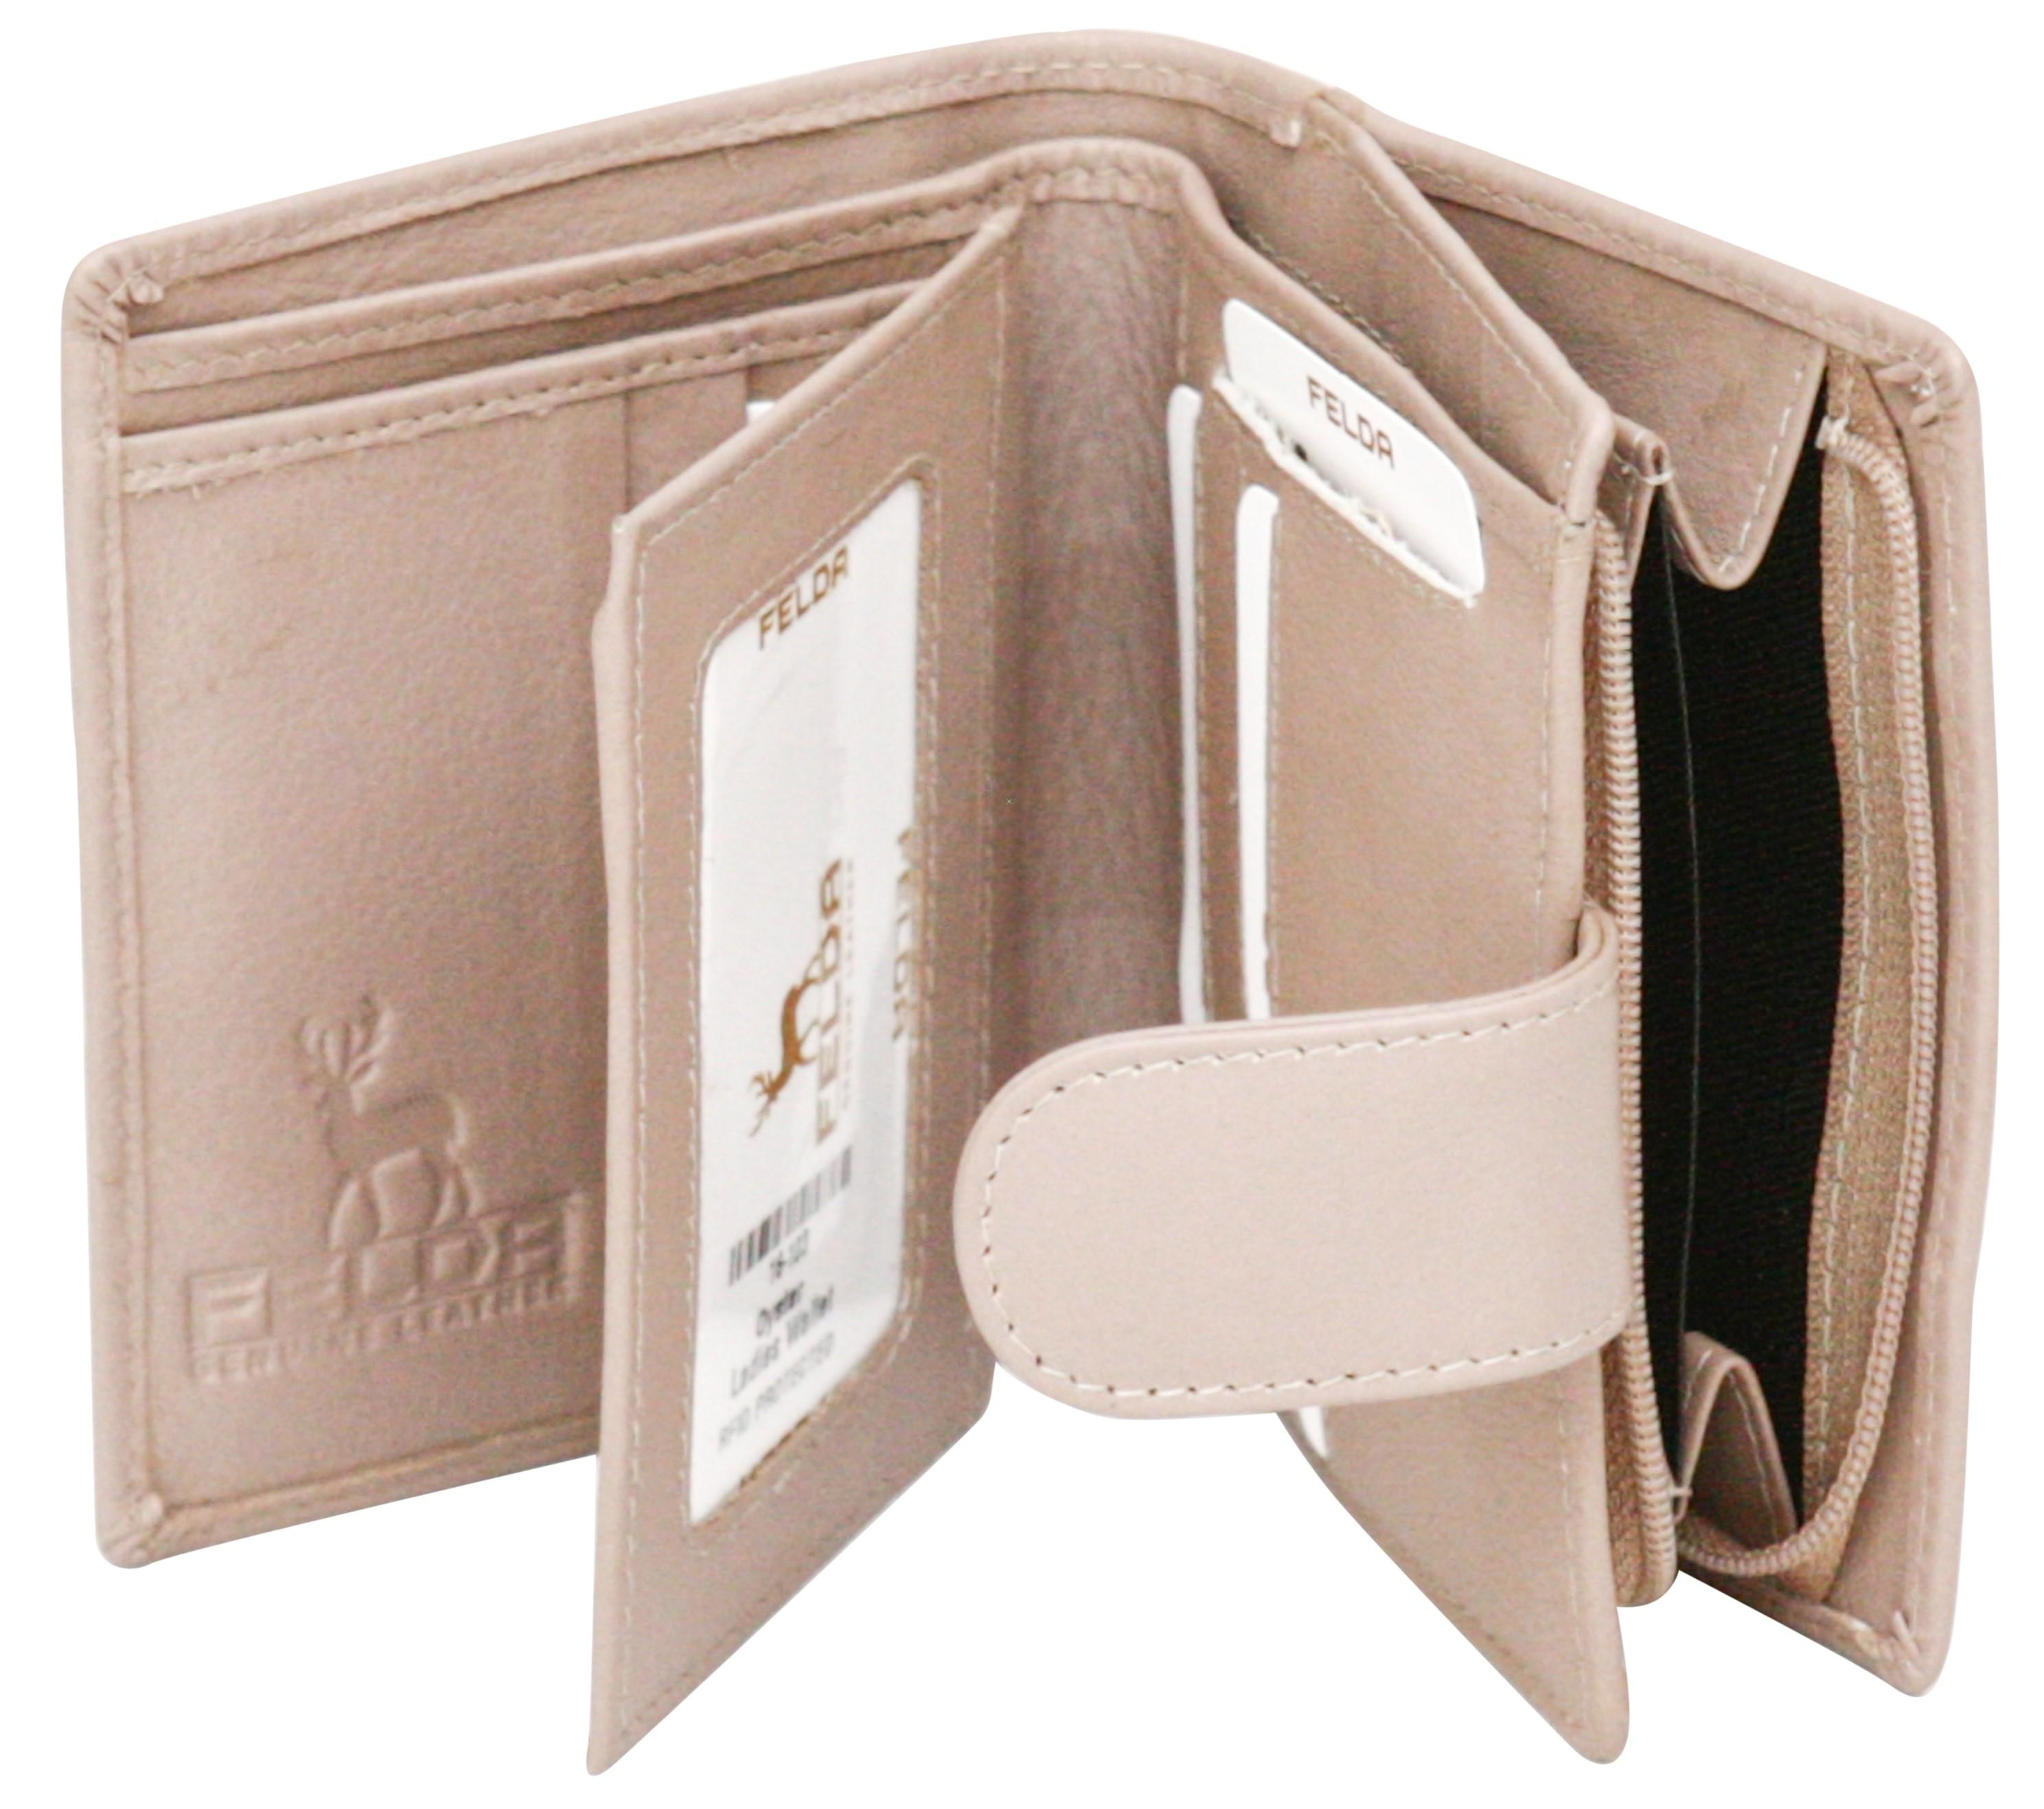 Felda-RFID-onorevoli-MEDAGLIA-amp-Card-Purse-Wallet-Genuine-Leather-Multi-SOFT-BOX-REGALO miniatura 76